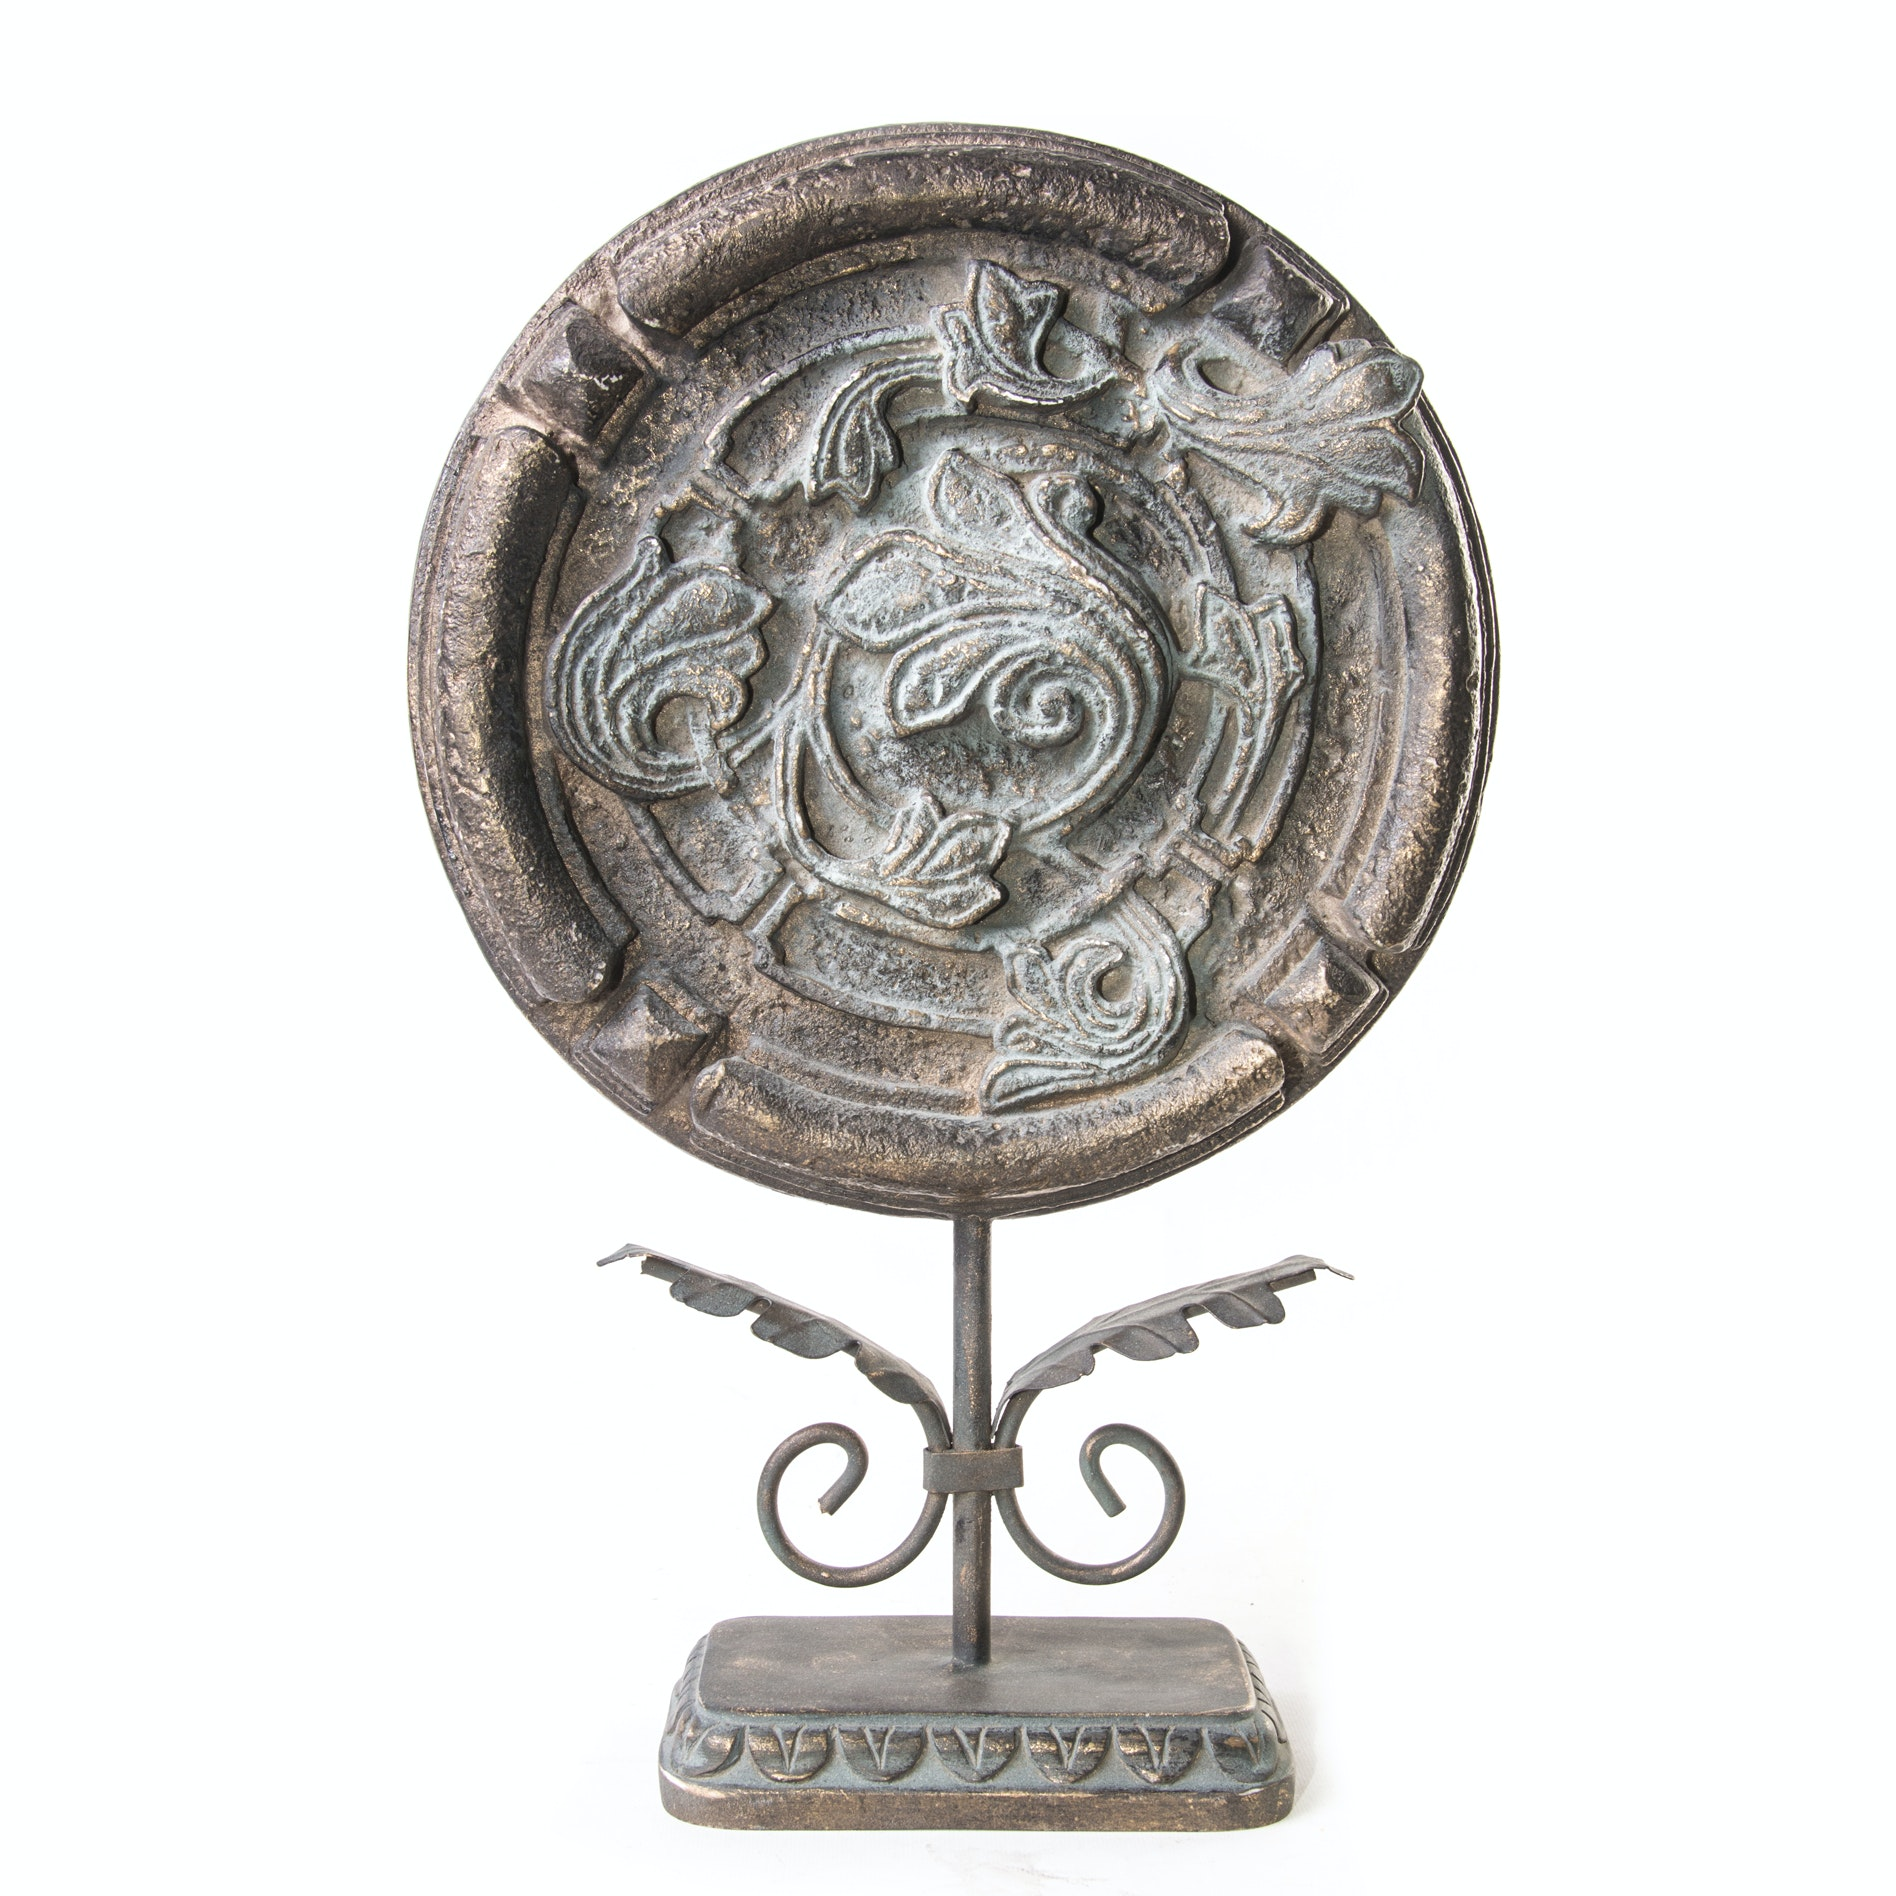 Decorative Resin and Brass Medallion Sculpture